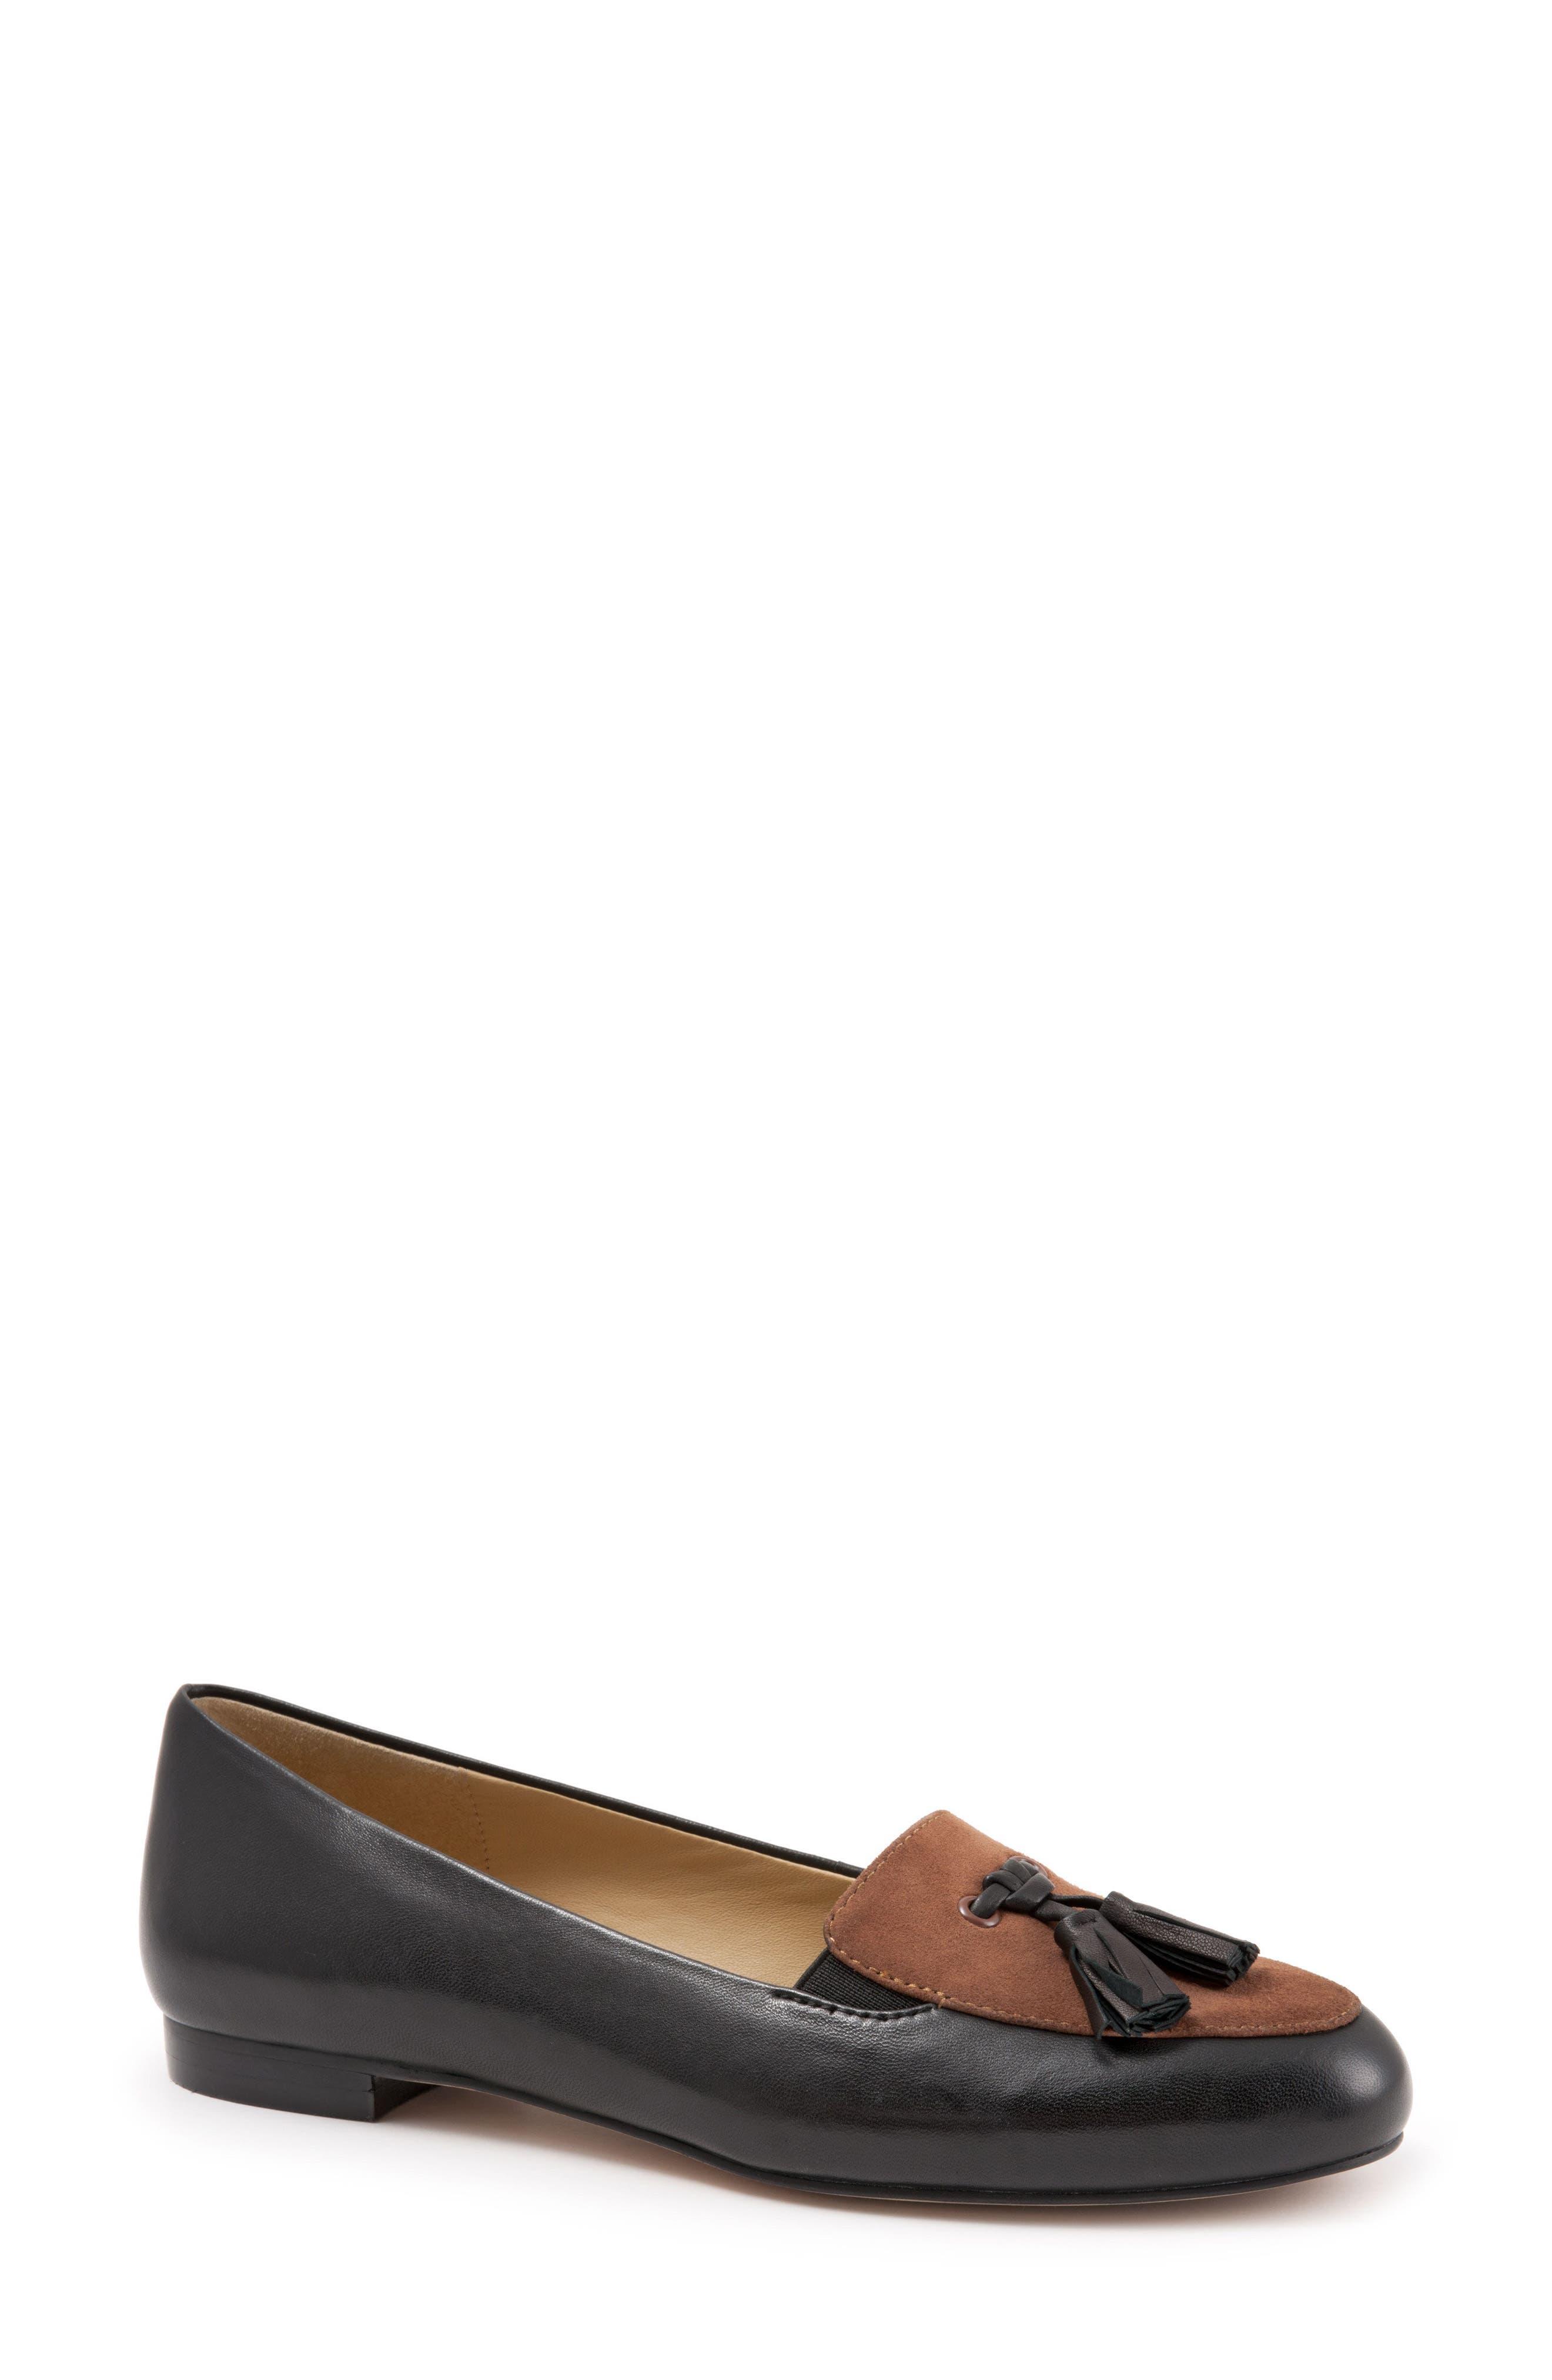 'Caroline' Tassel Loafer,                             Main thumbnail 1, color,                             Black/ Tobacco Leather